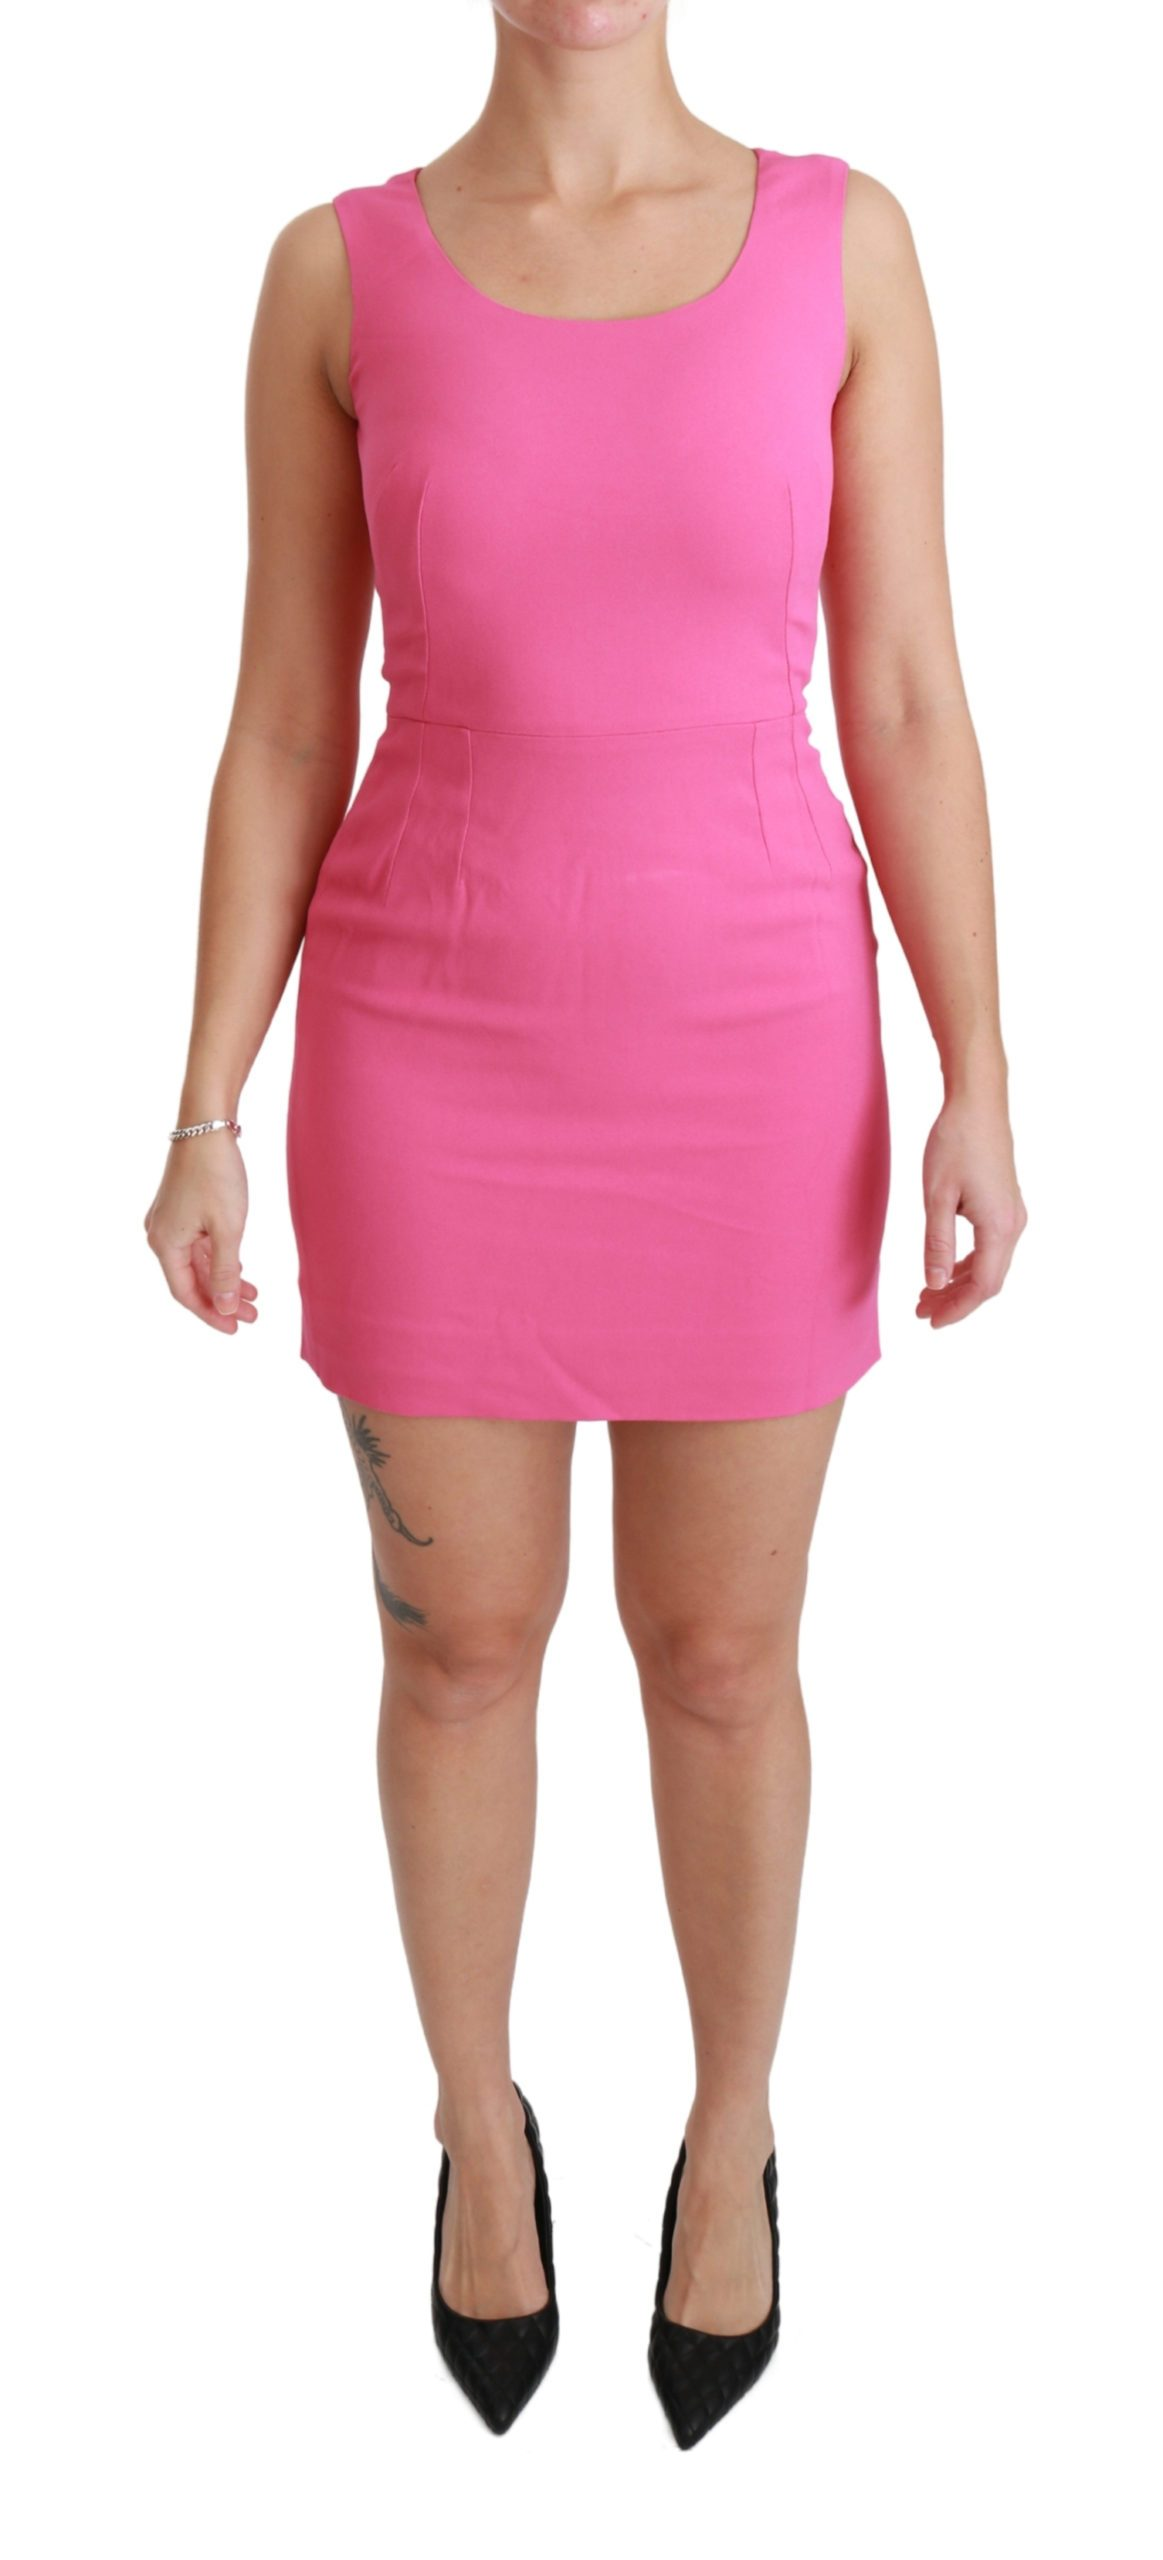 Dolce & Gabbana Women's Stretch Sheath Mini Bodycon Dress Pink DR2458 - IT40|S